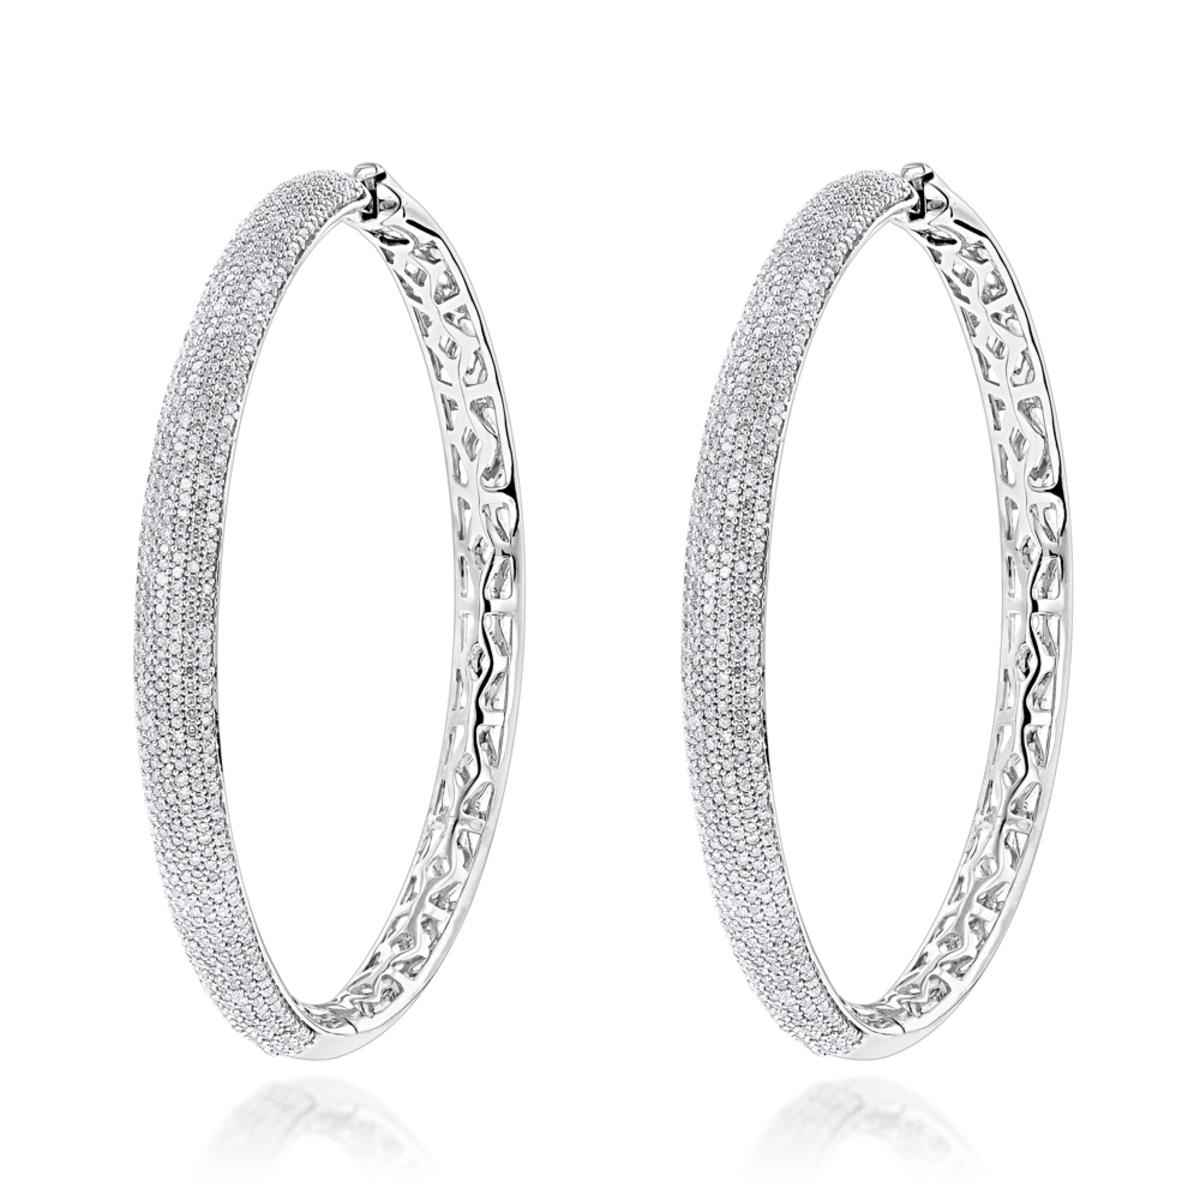 2 Inch Diamond Hoop Earrings 2.2ct 14K Gold